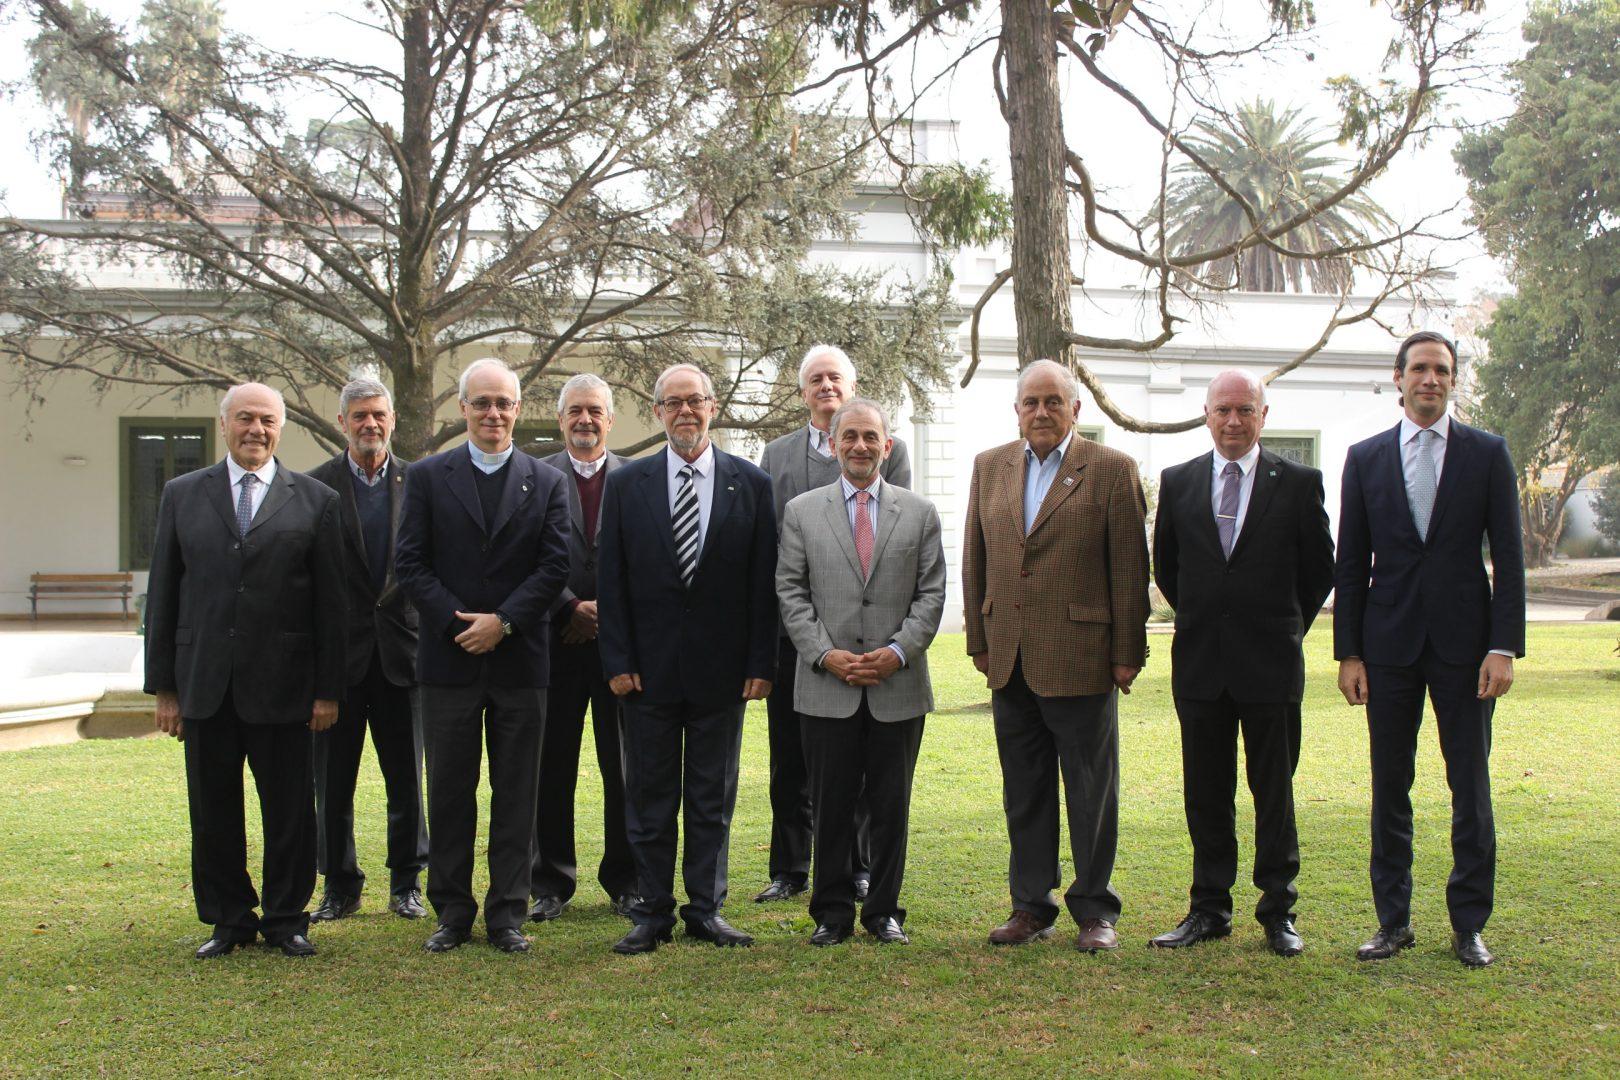 El Rector de la Universidad de Haifa, Israel, visitó la UBP